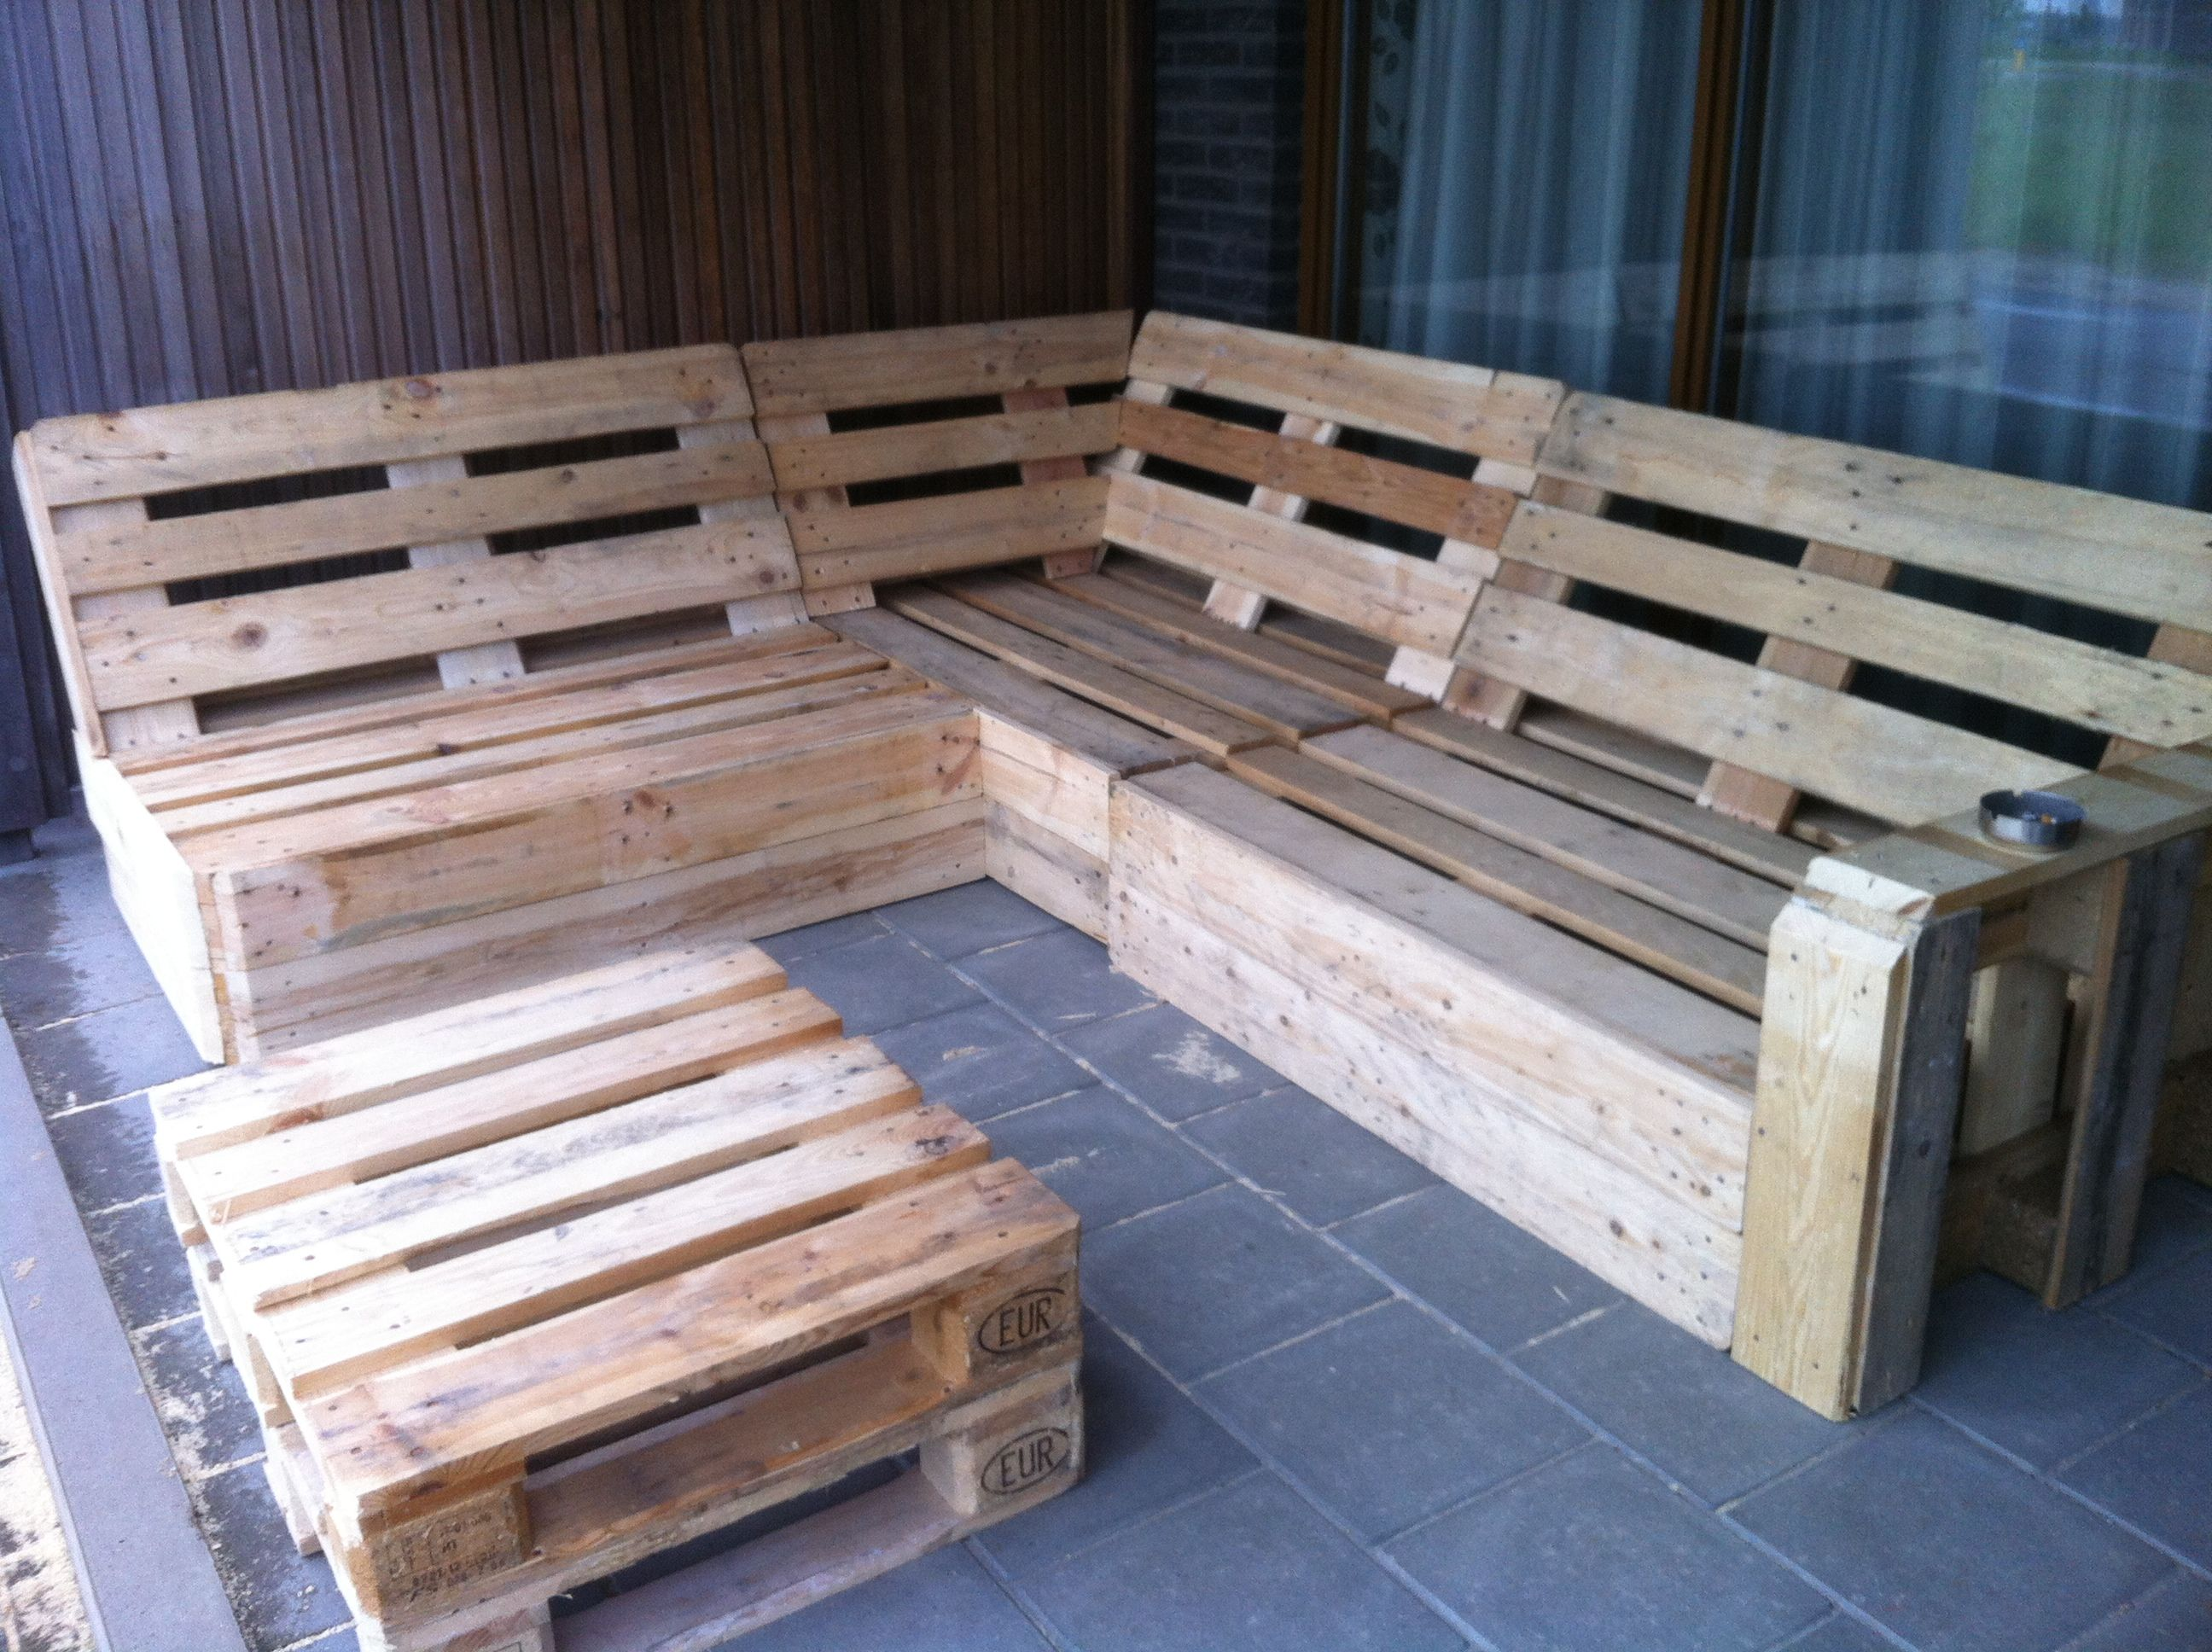 tisch aus paletten 2015 trends wohlf hl oase pinterest pallets wood design and pallet. Black Bedroom Furniture Sets. Home Design Ideas